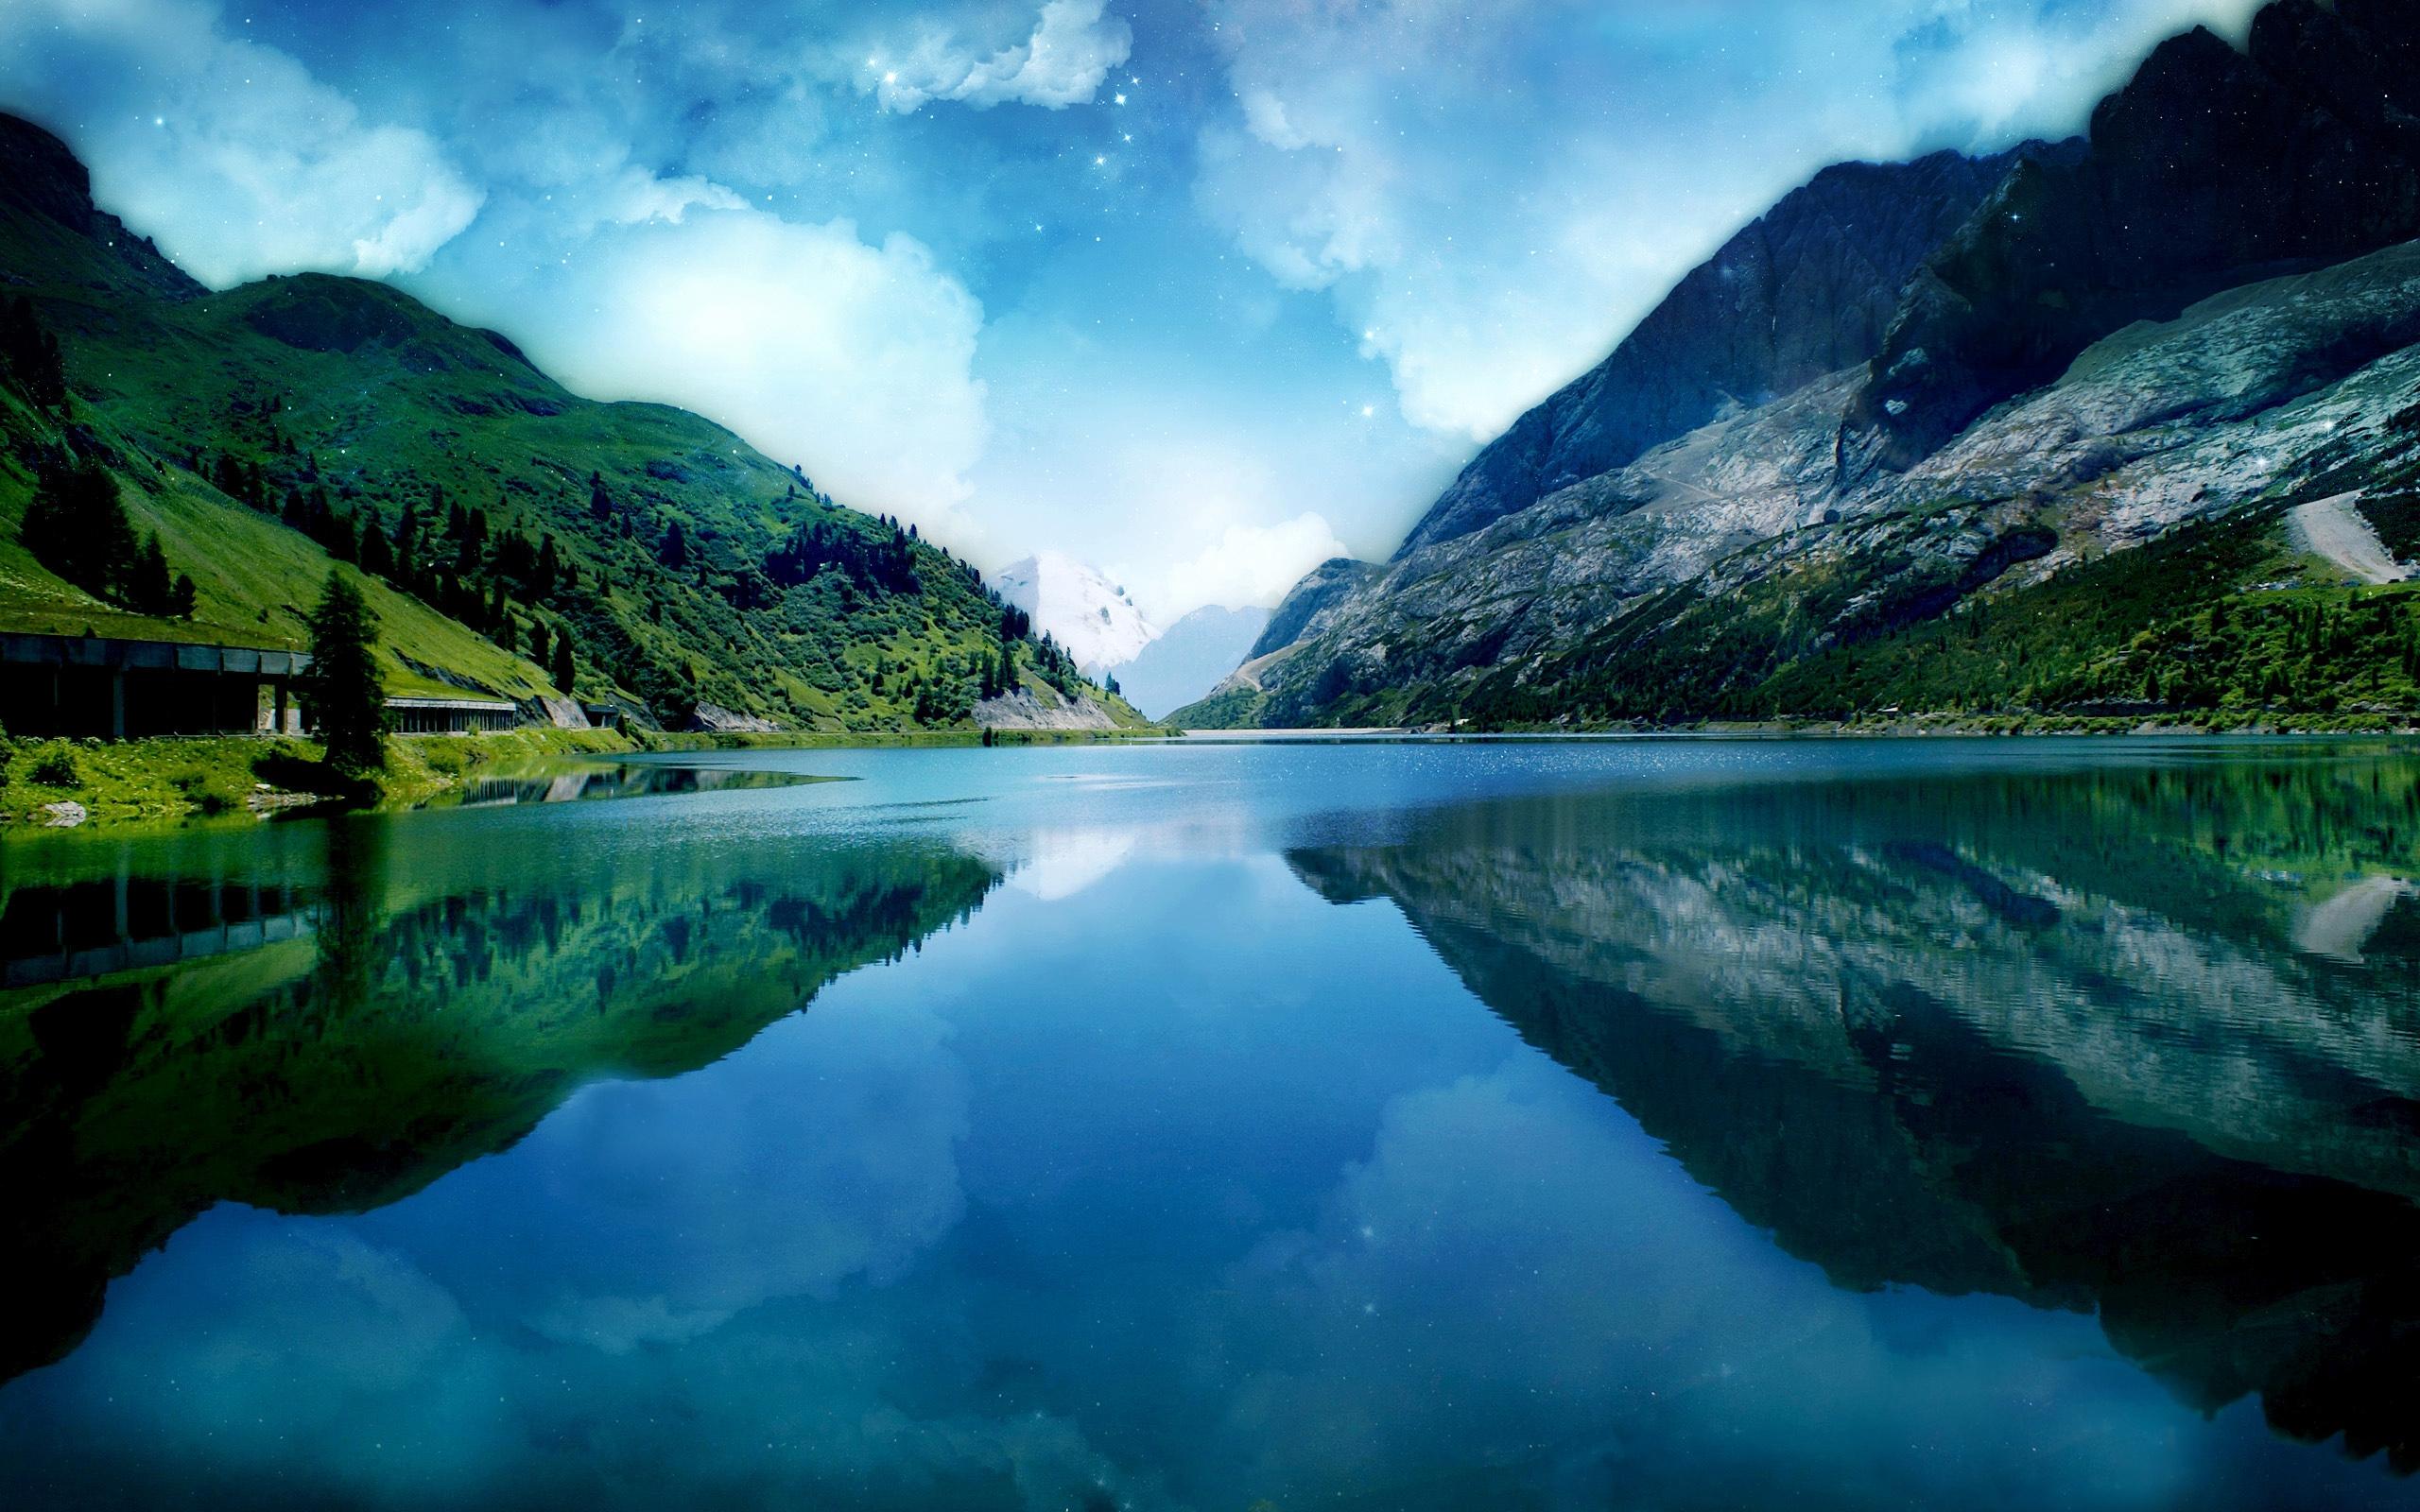 Blue Sky River Scene Wallpapers   2560x1600   2232025 2560x1600